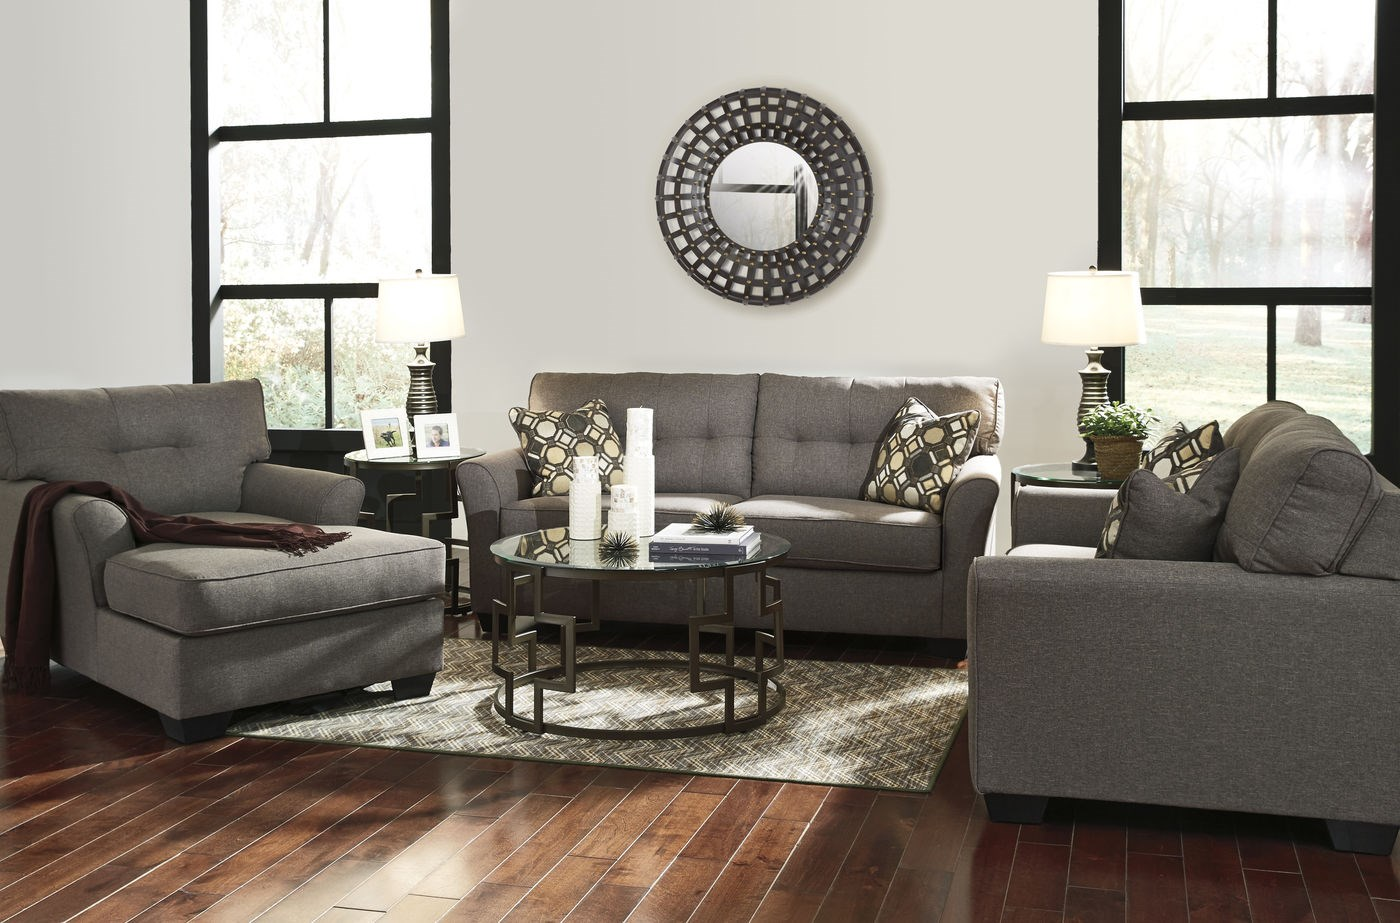 Darvin Furniture Orland Park Chicago IL